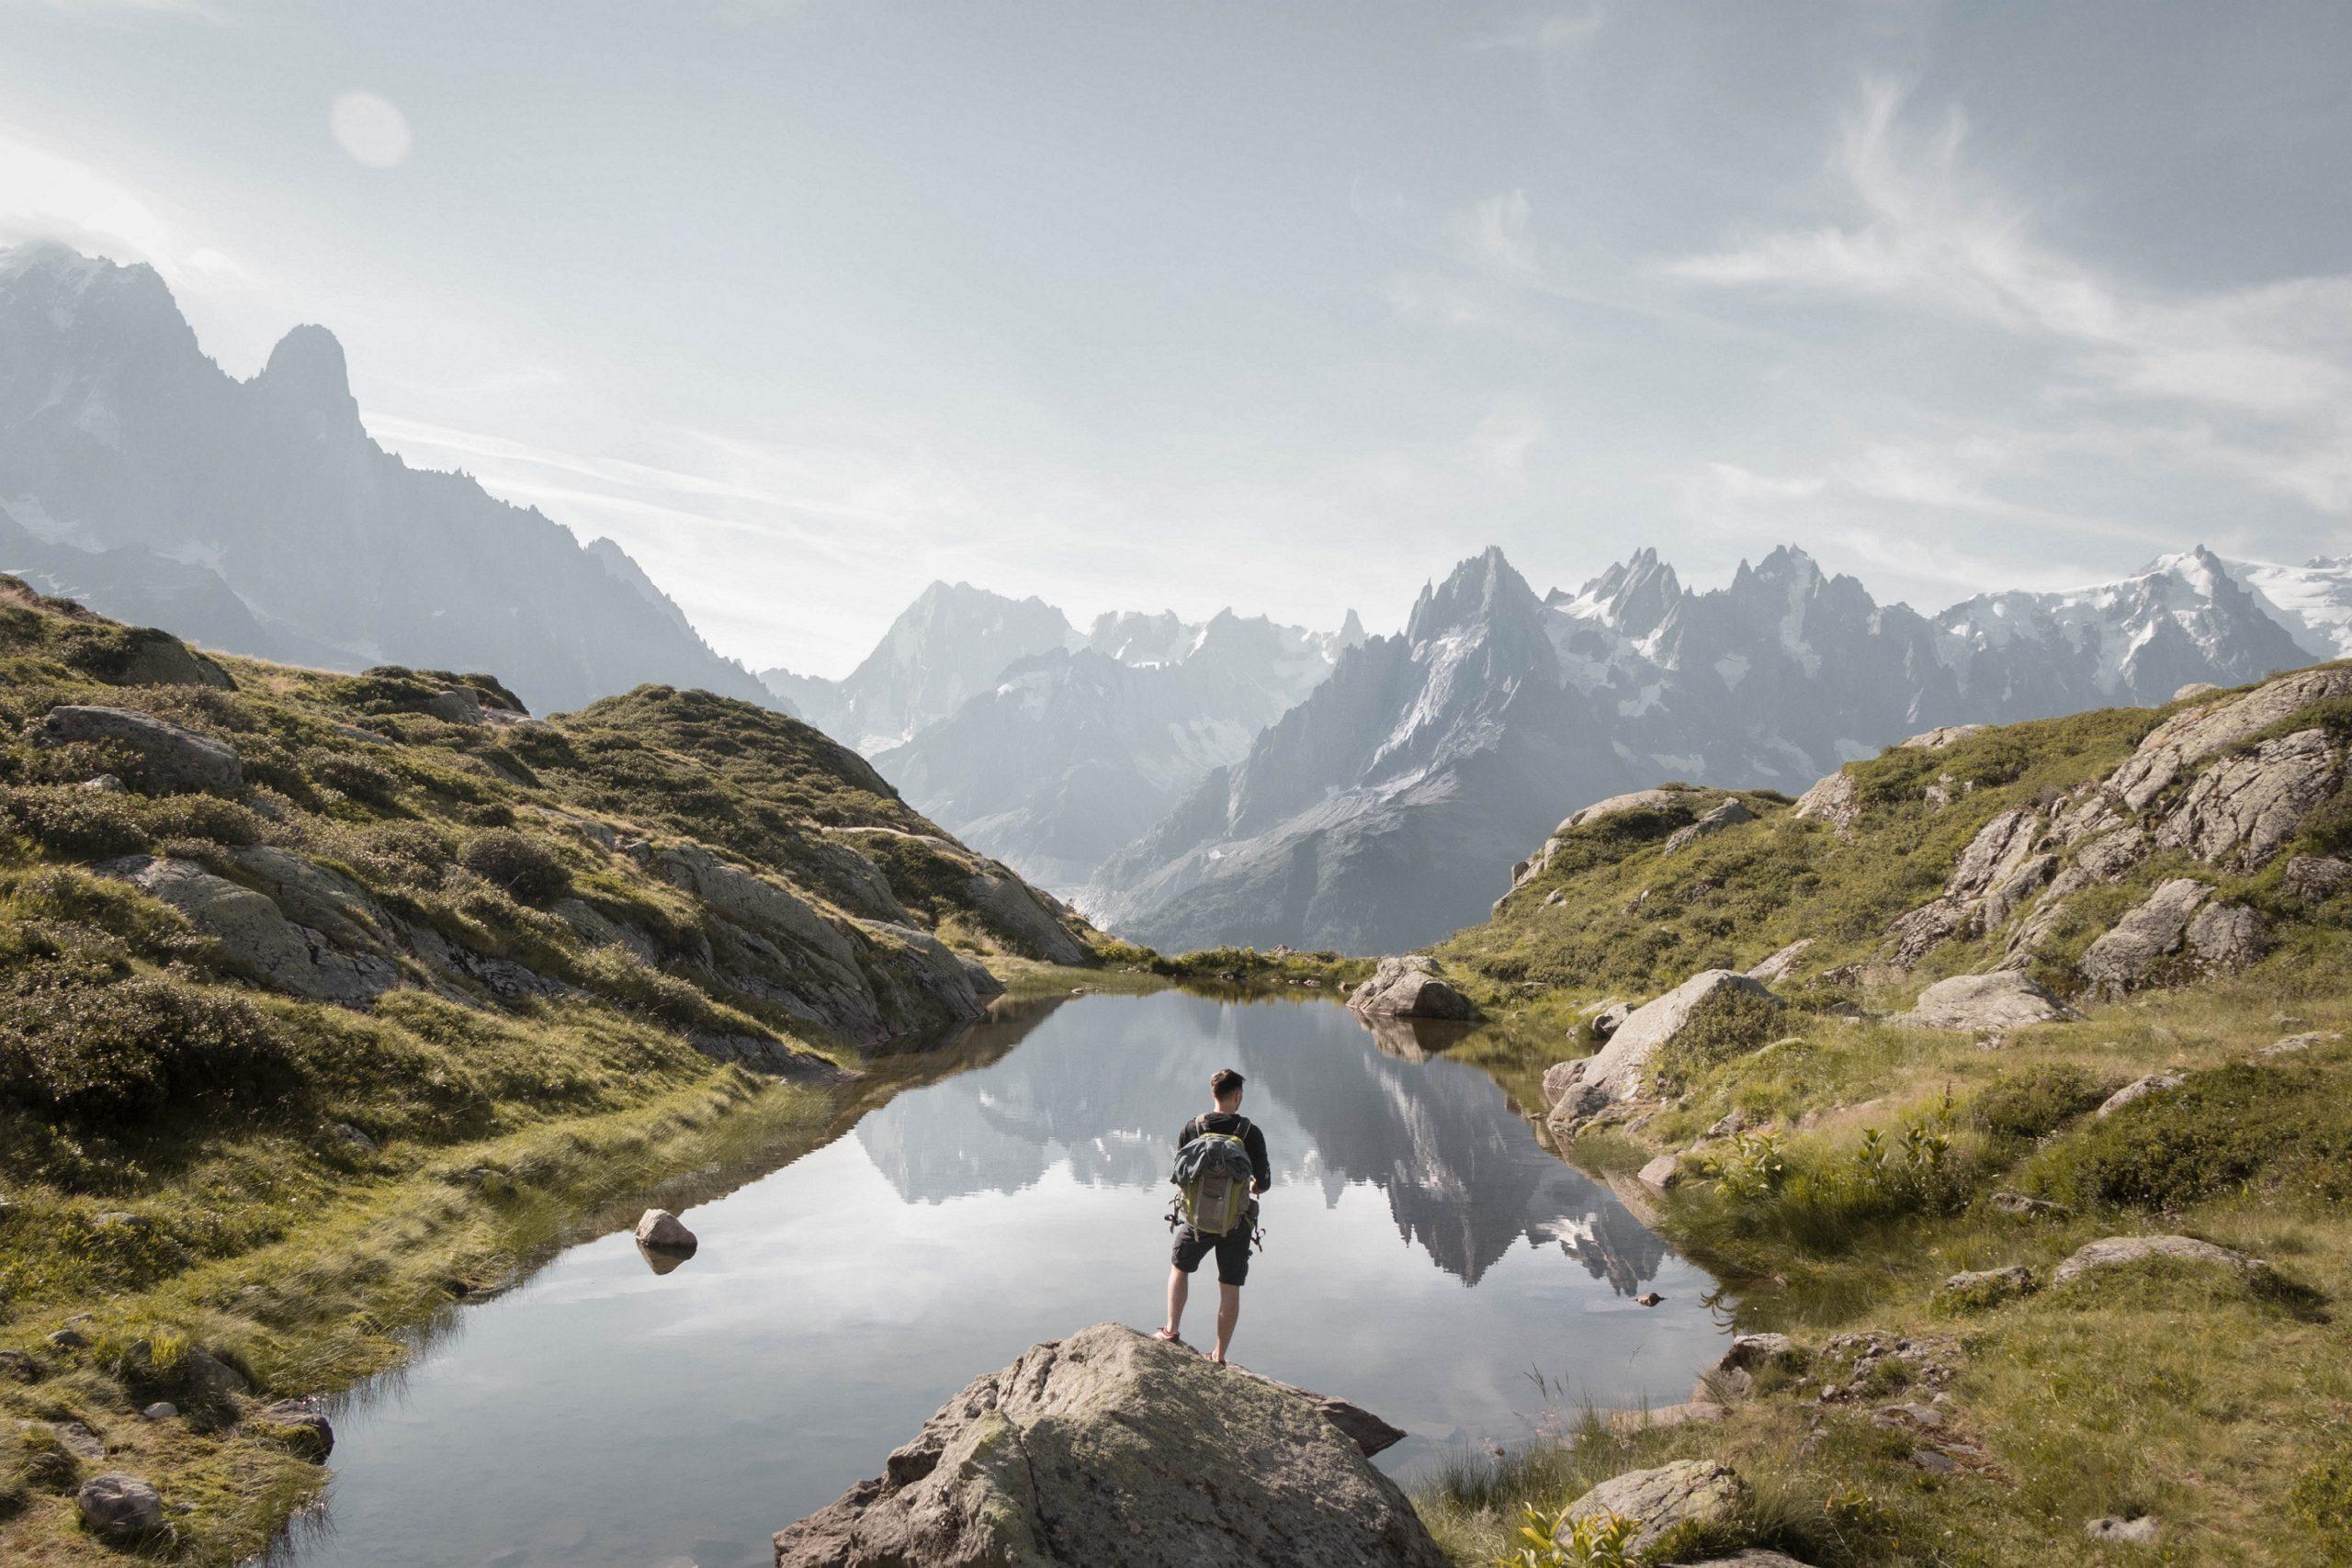 Parc naturel regional Rhone Alpes